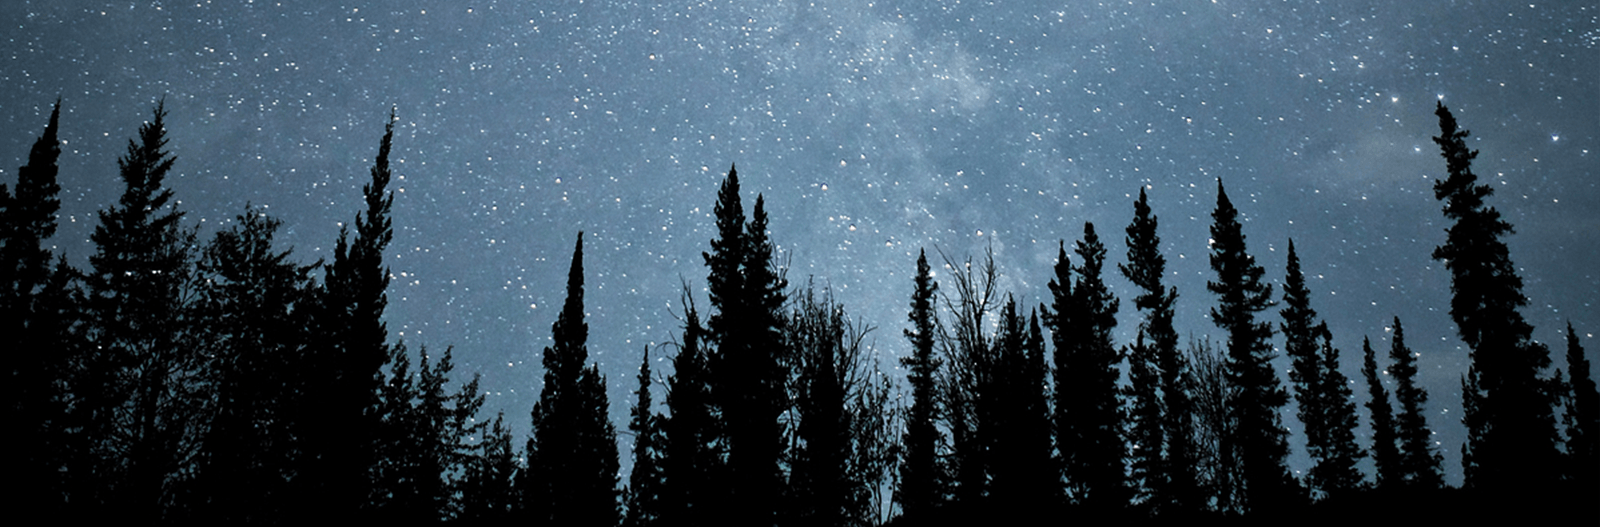 stars above trees